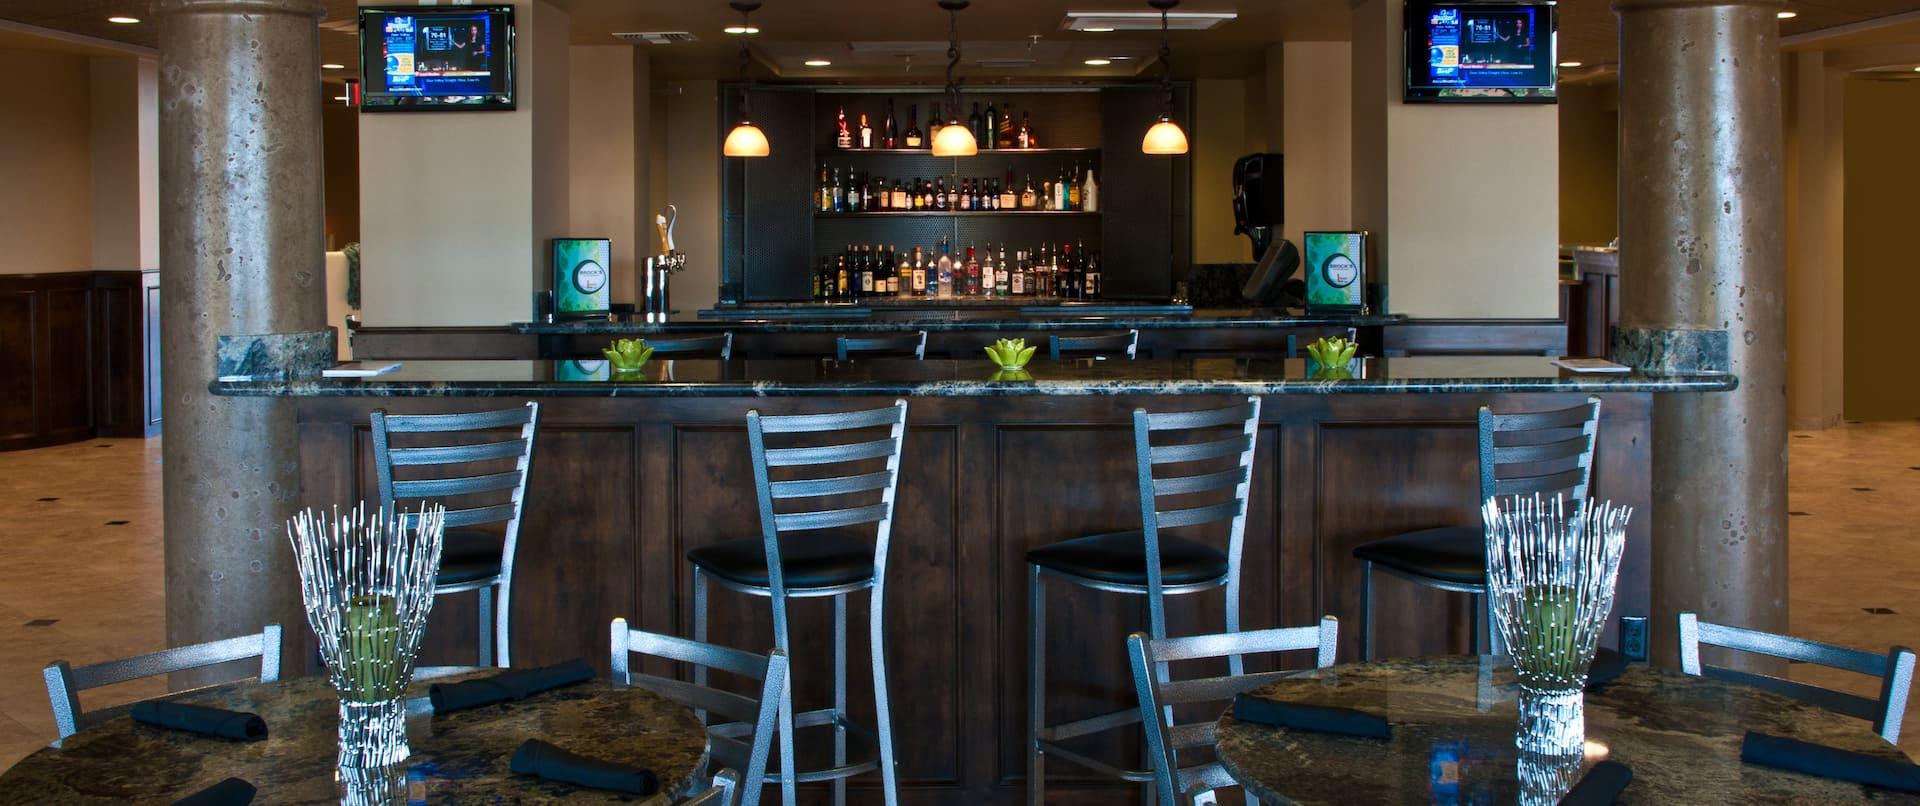 Brock's Restaurant and Bar